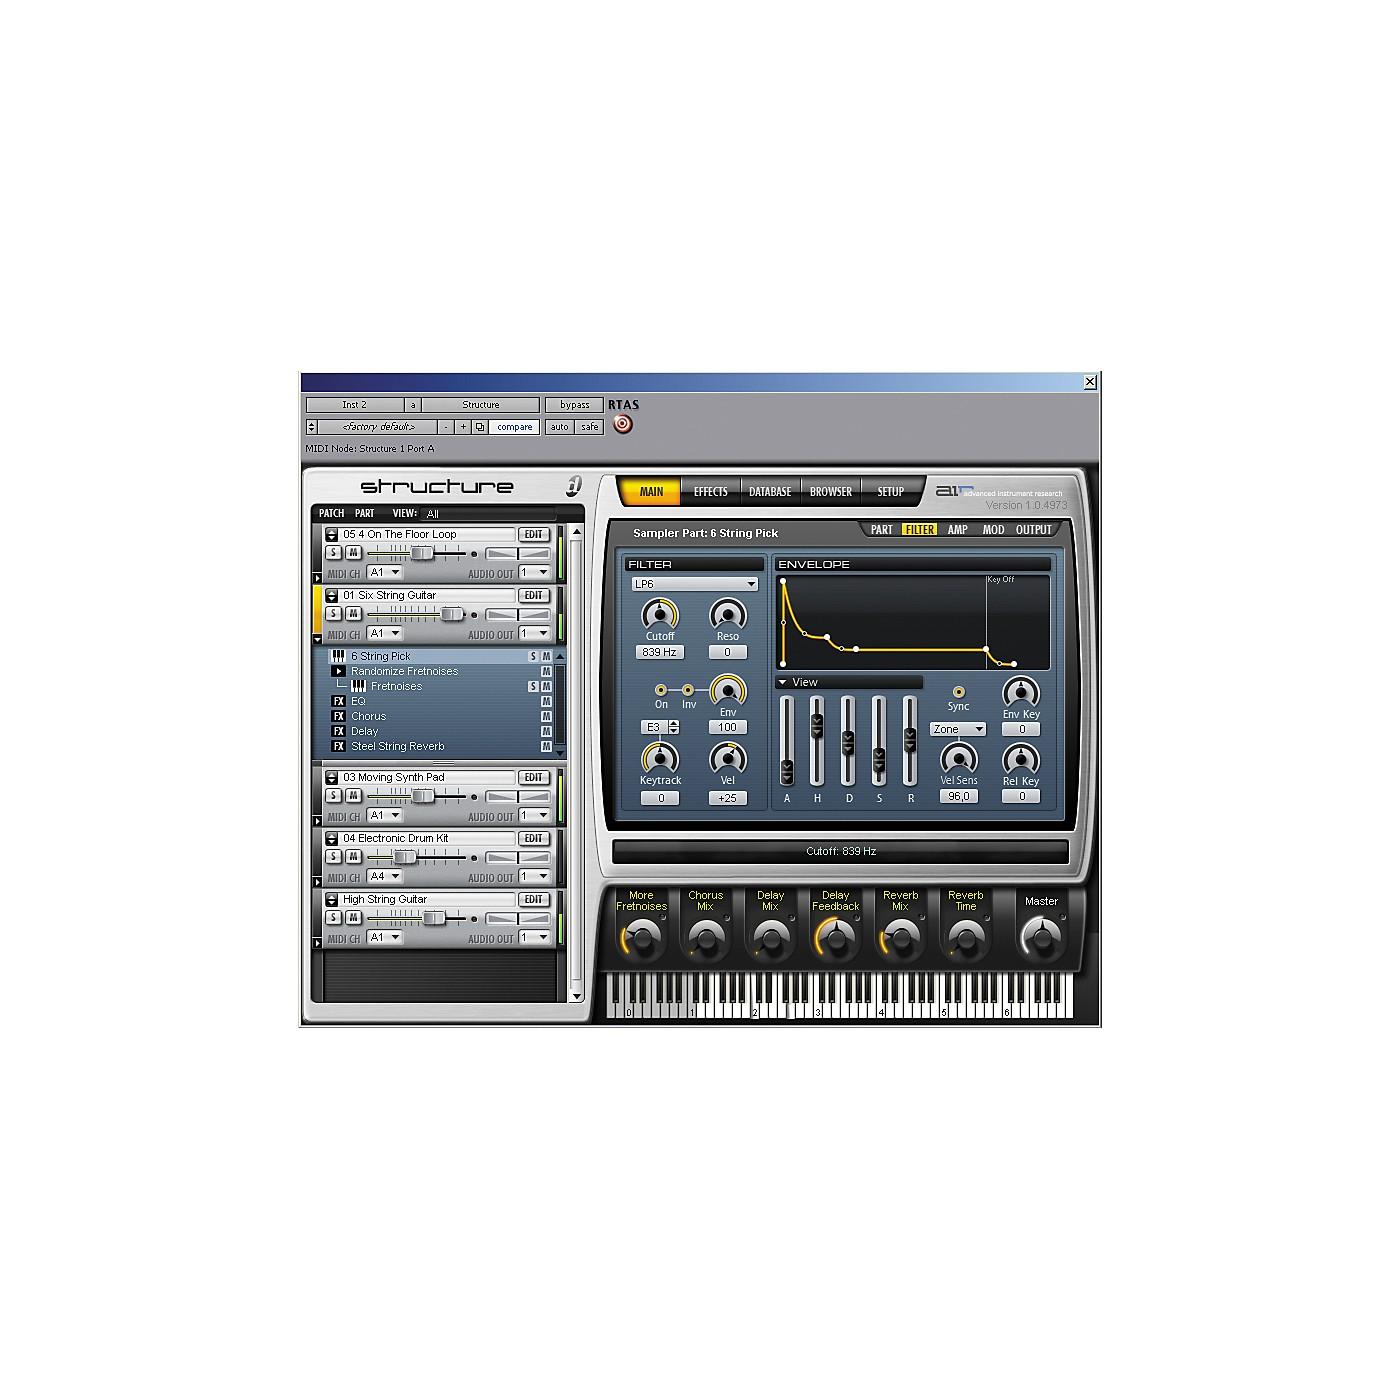 Digidesign Structure LE Sampler Virtual Instrument thumbnail